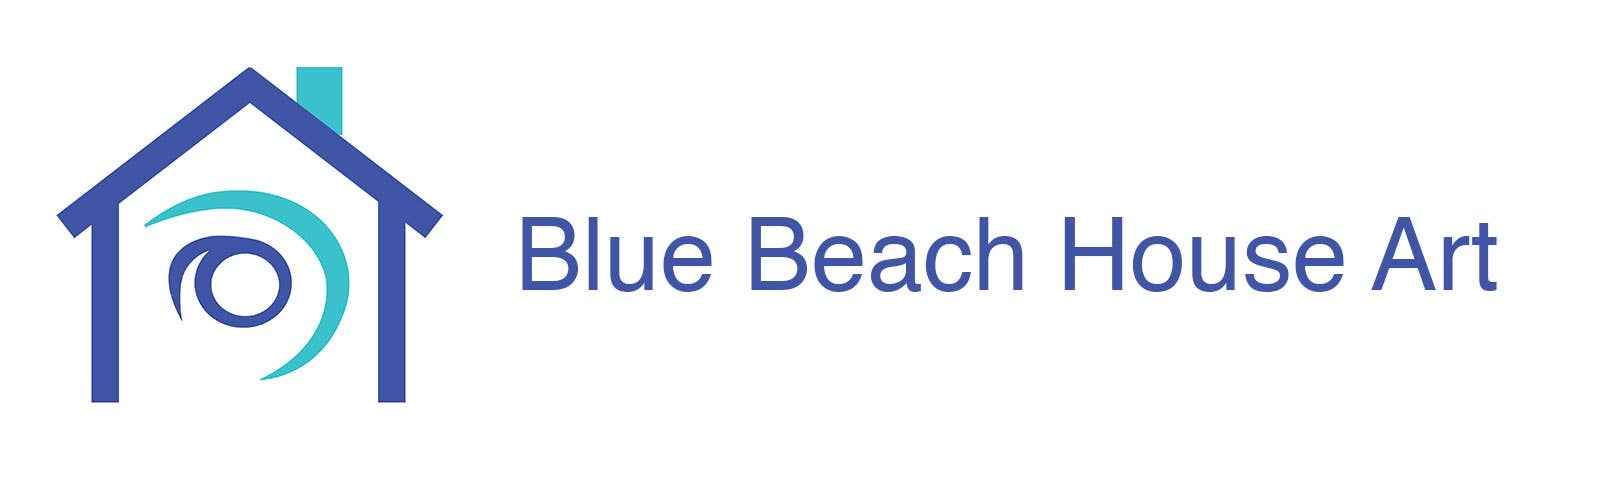 Blue Beach House Art Logo